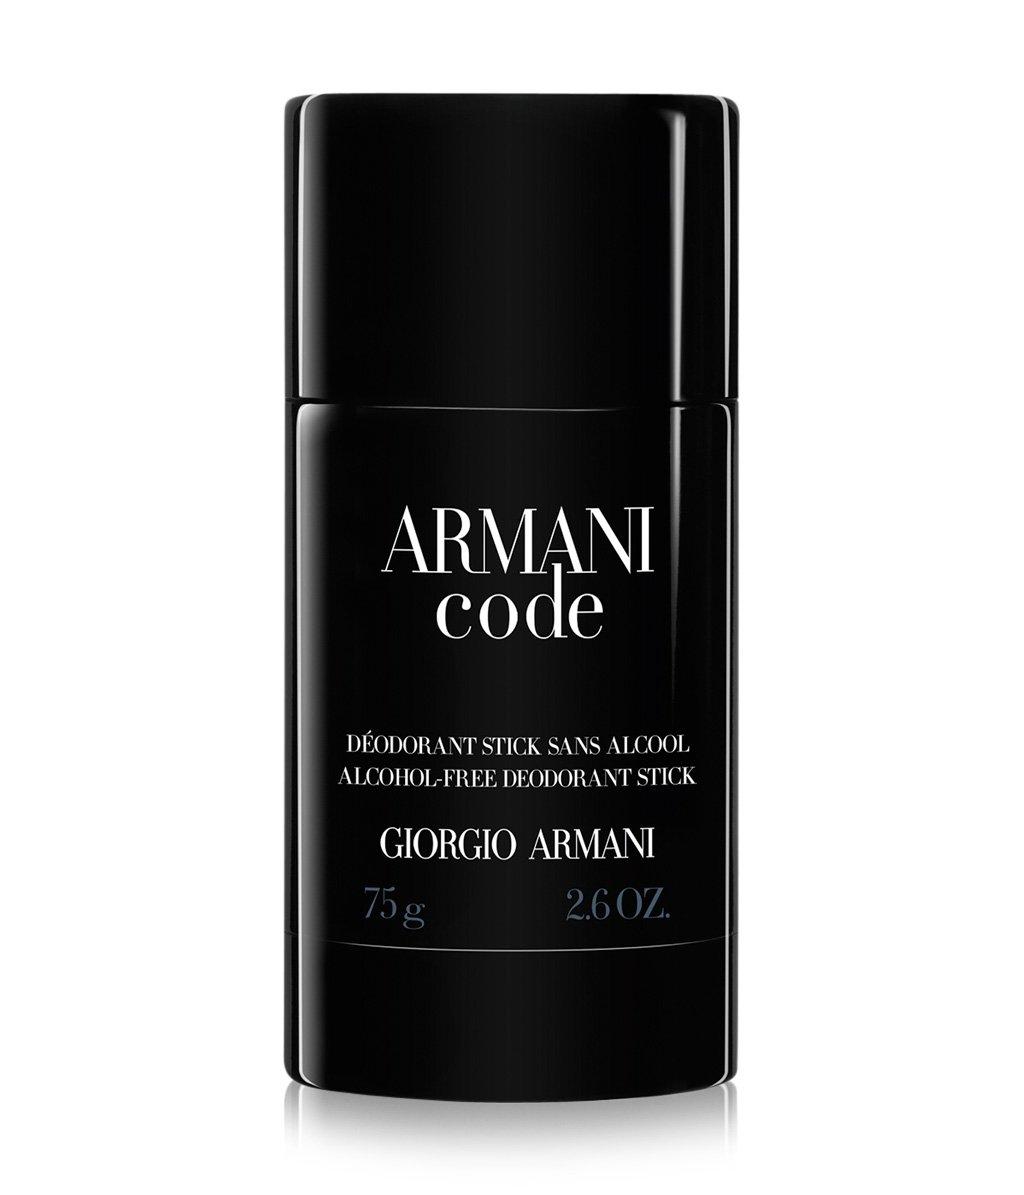 giorgio armani code homme deodorant stick bestellen flaconi. Black Bedroom Furniture Sets. Home Design Ideas